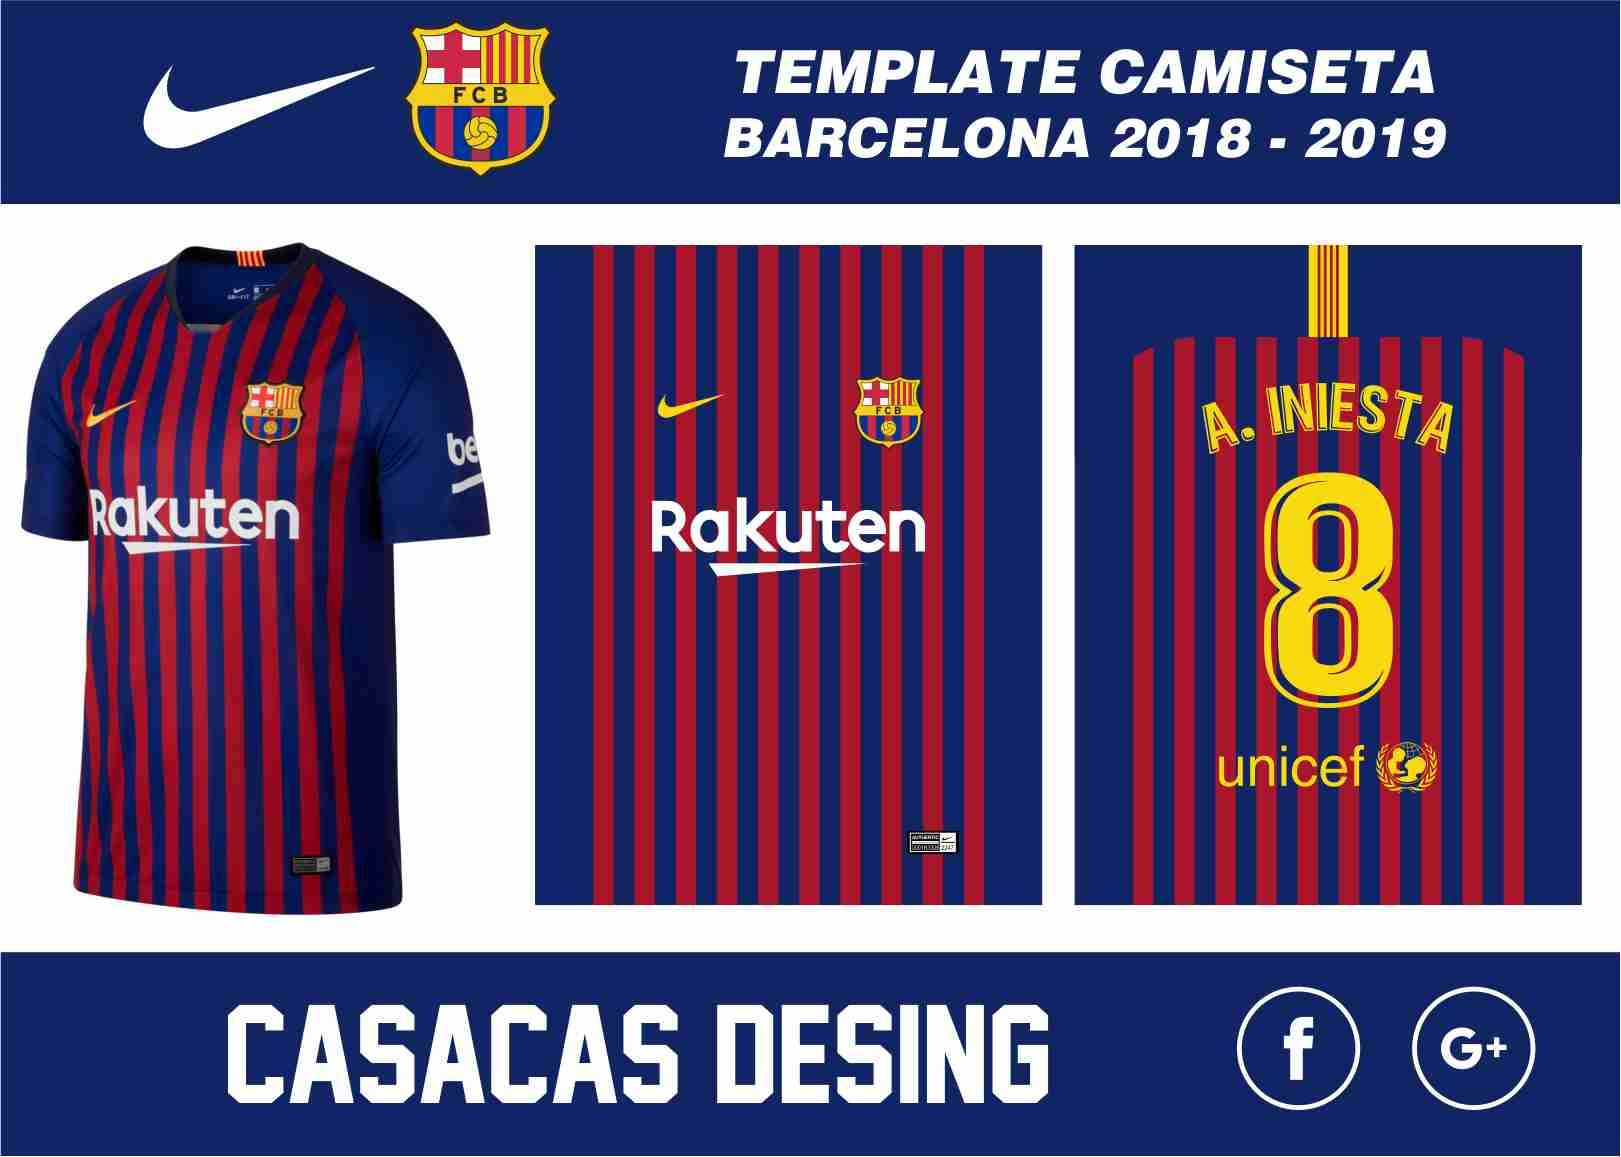 Camiseta Barcelona 2018 2019 vector Vector Camisetas